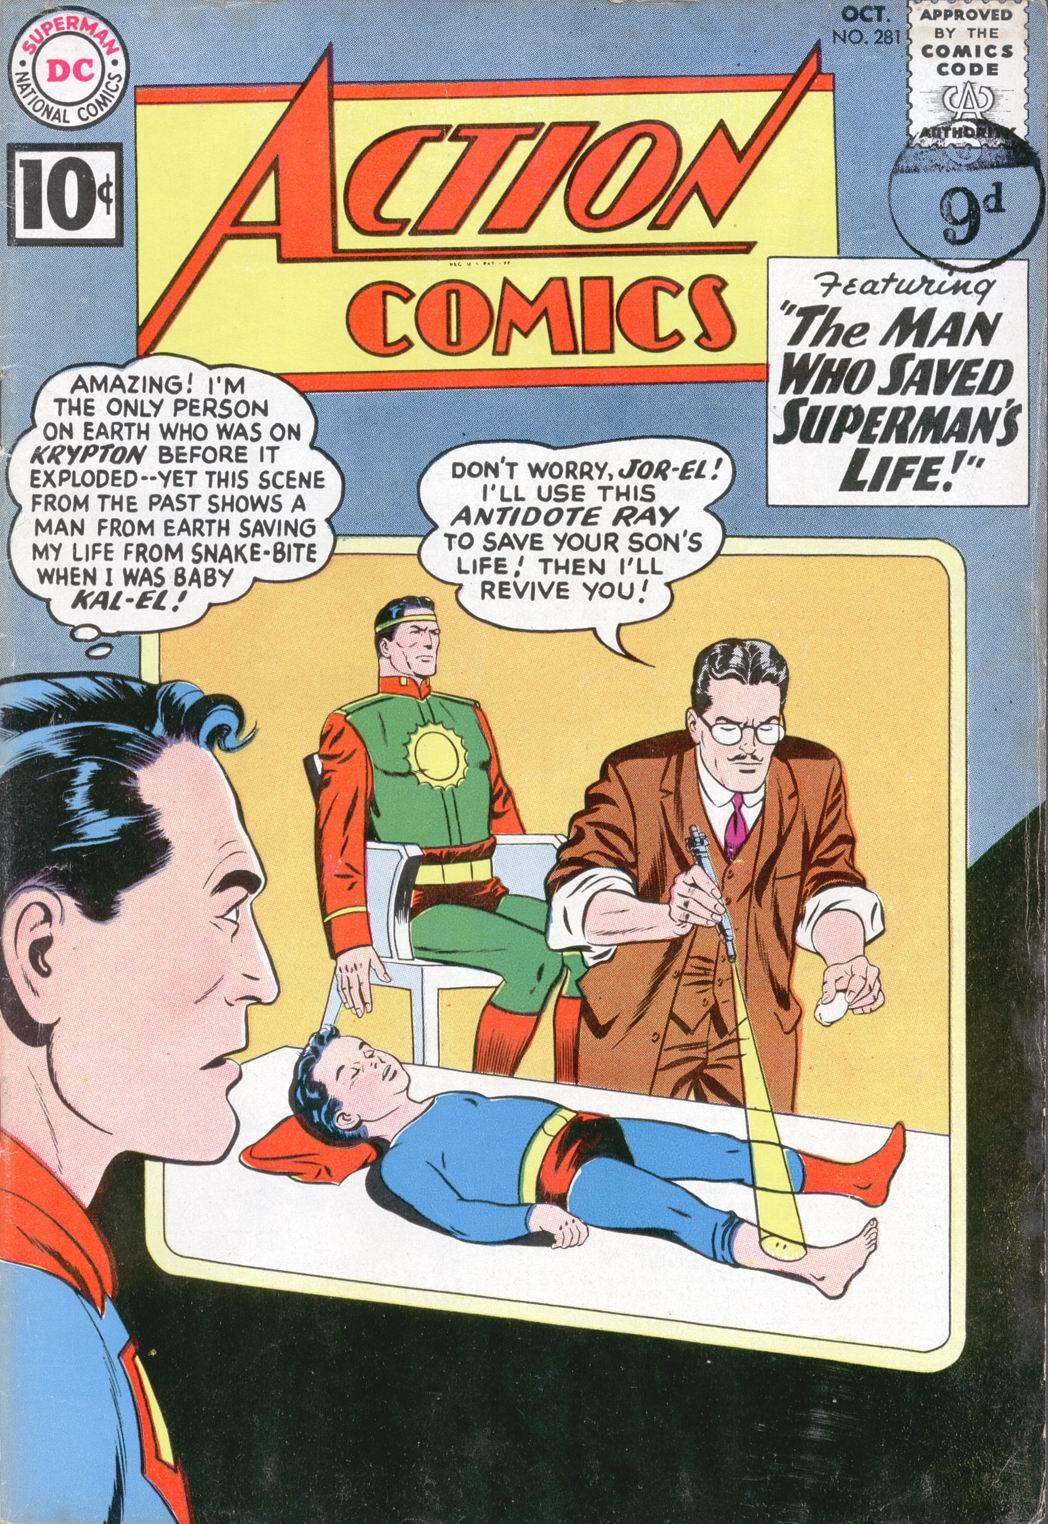 Action Comics (1938) 281 Page 1